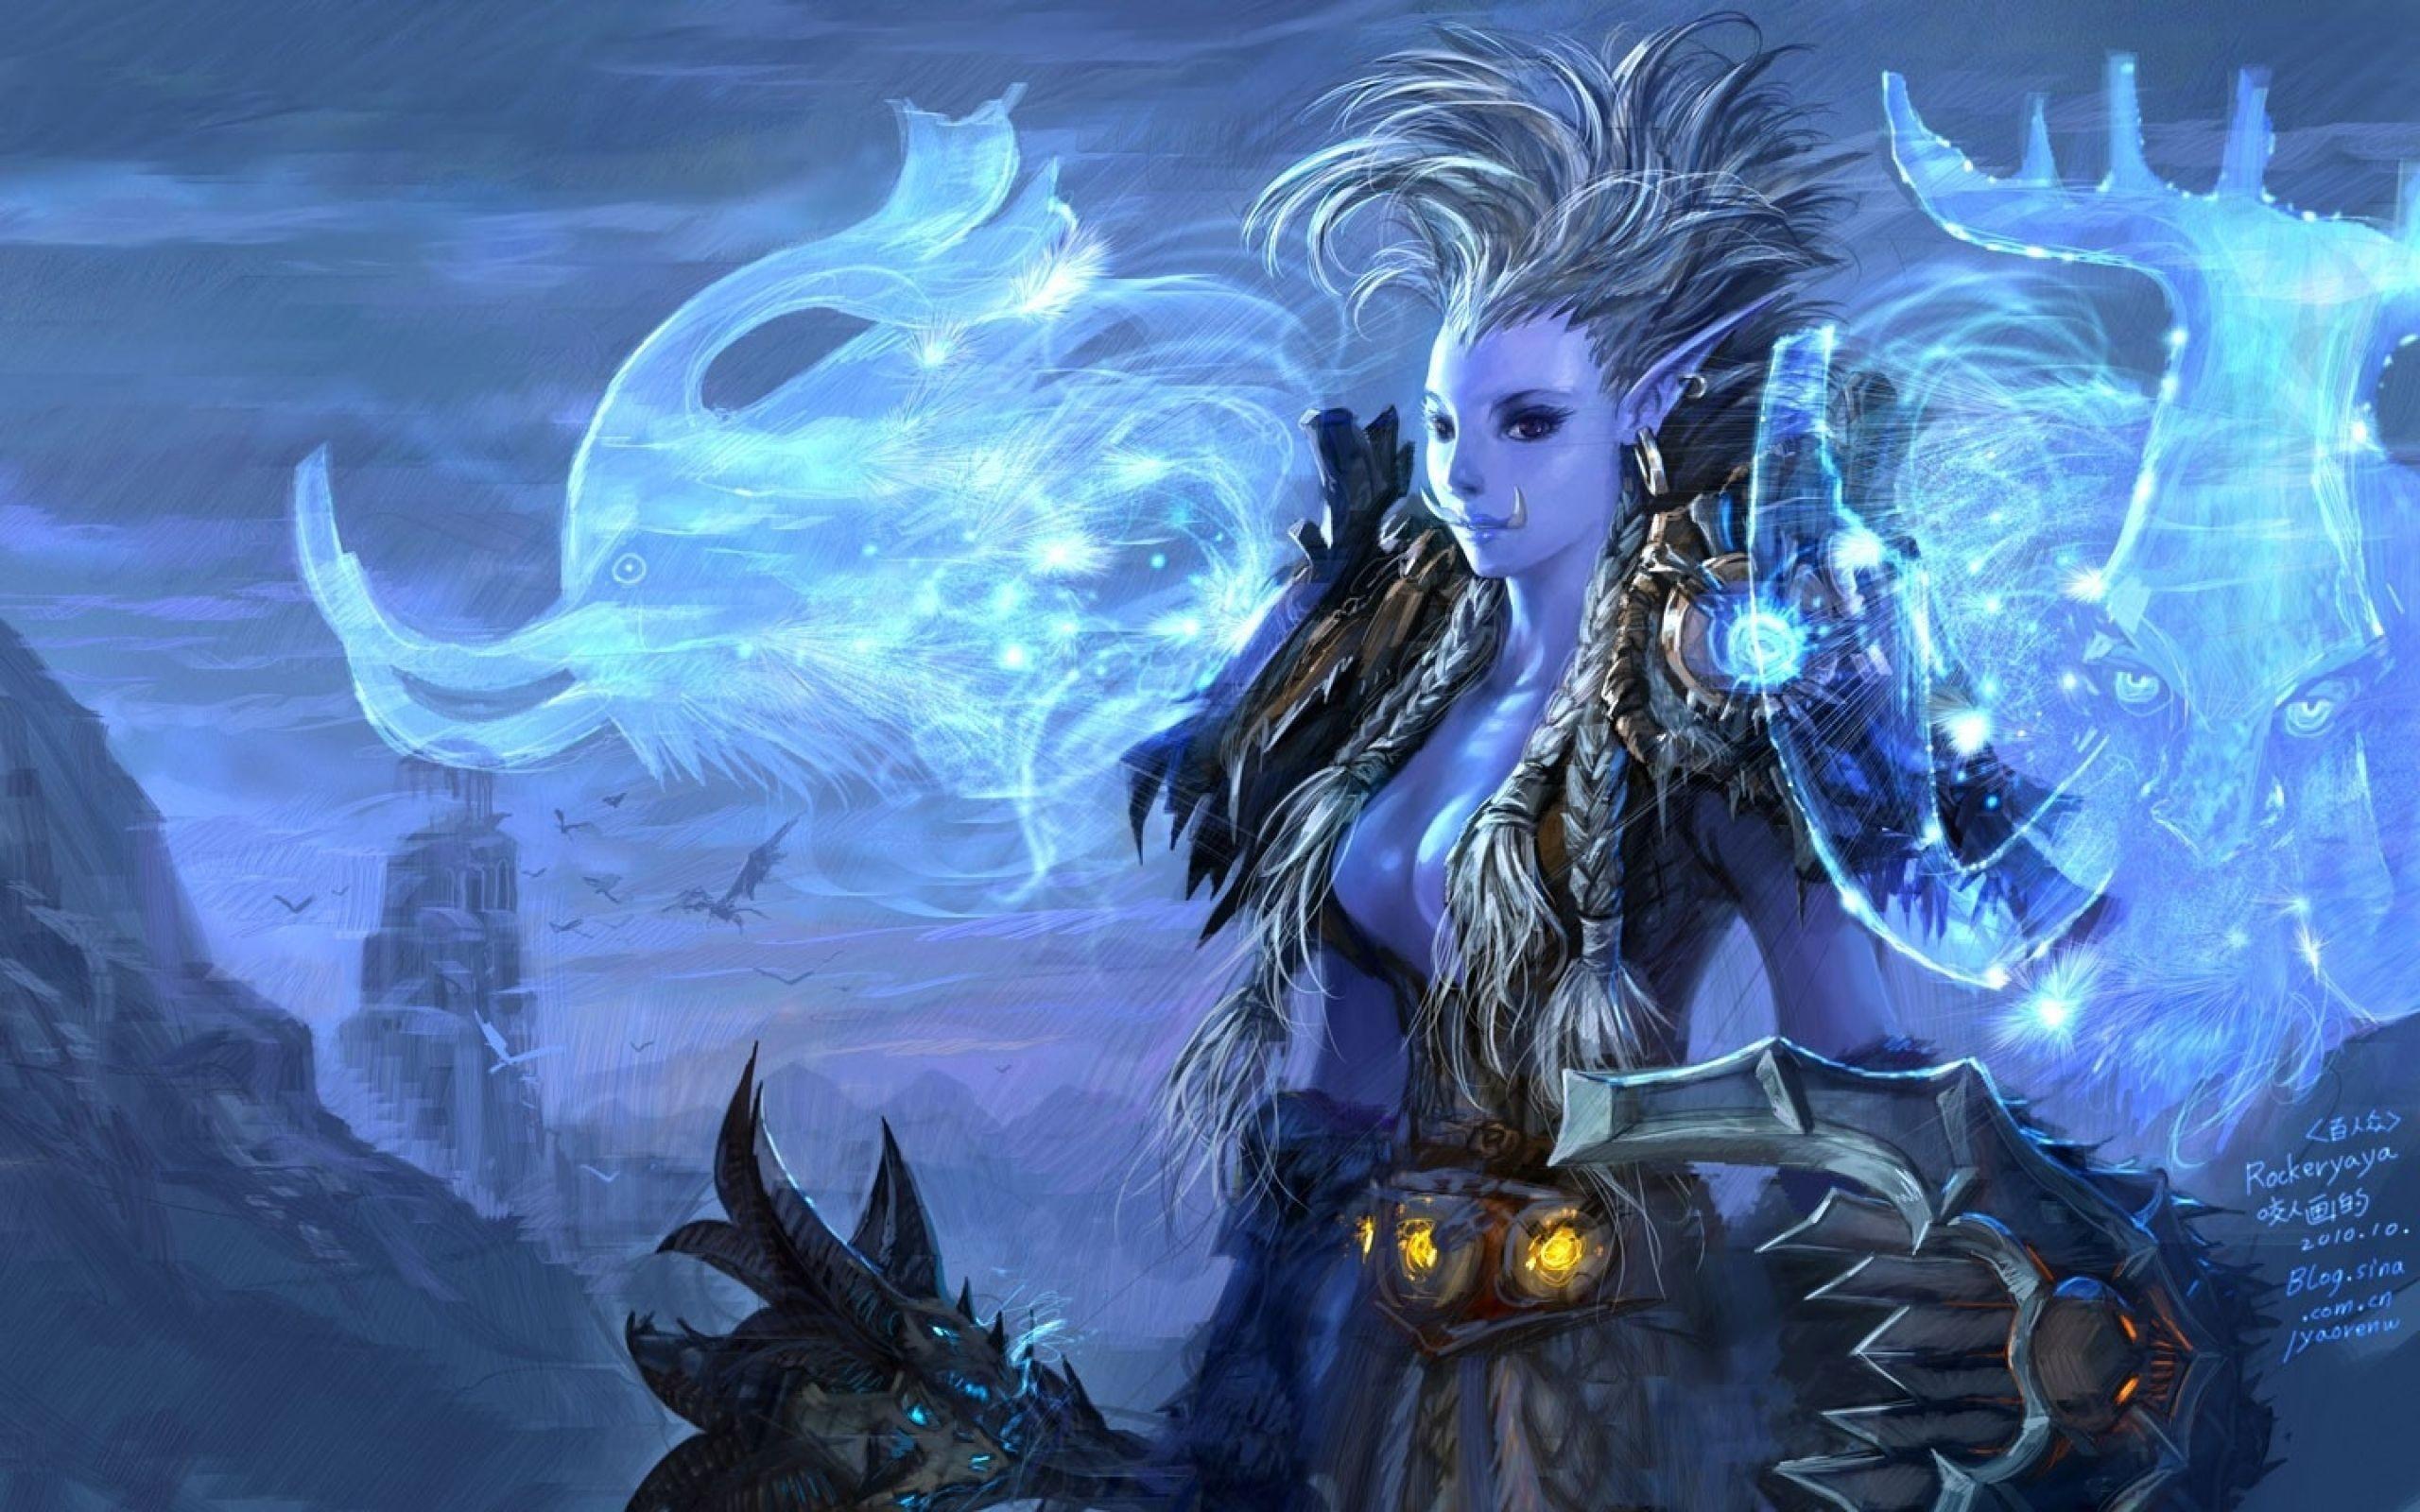 video games World of Warcraft fantasy art armor magic artwork trolls  Yaorenwo wallpaper background